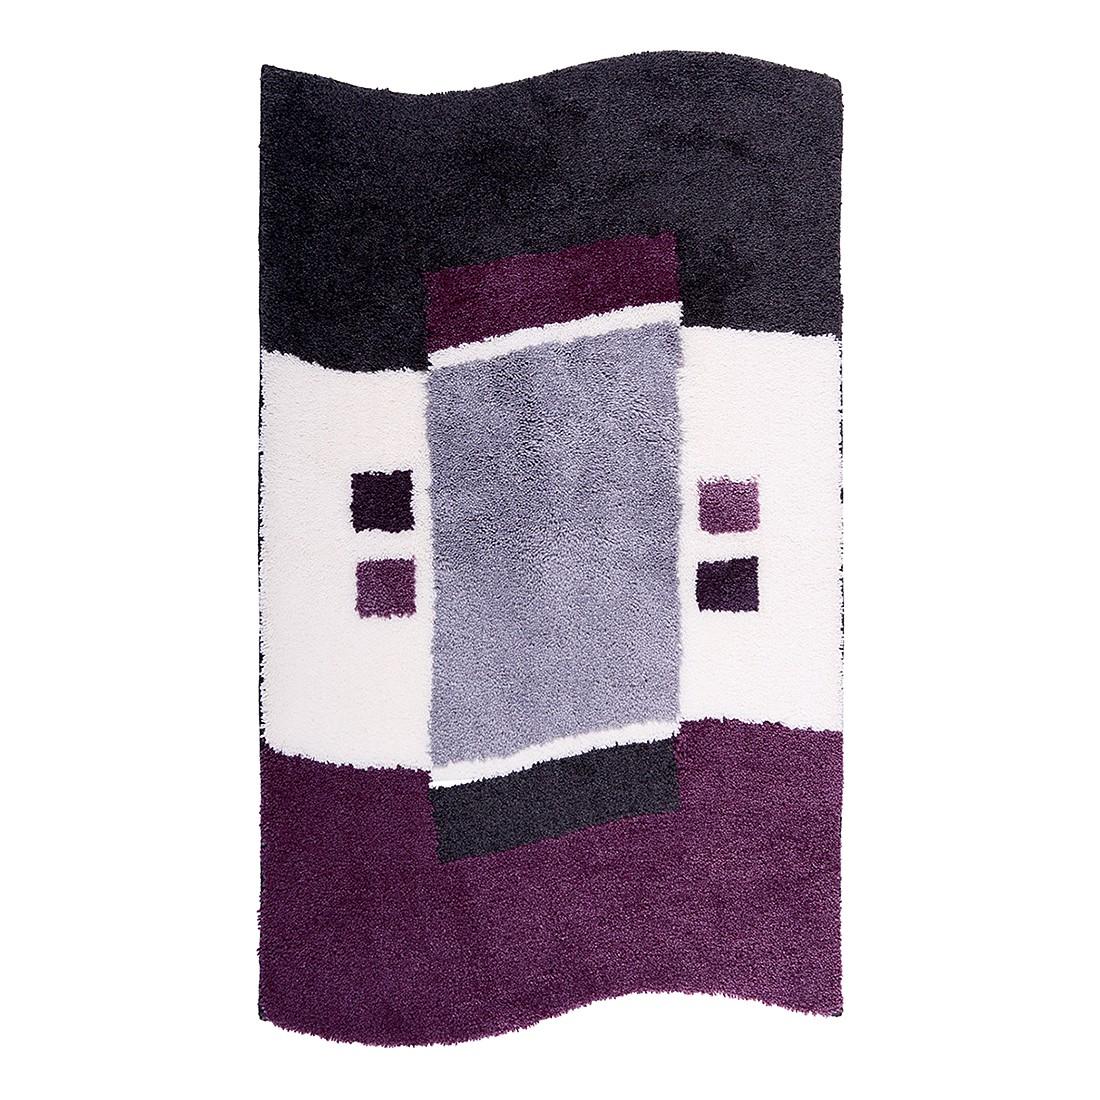 Vente tapis salle de bain tapis de bain tritoo maison et - Tapis de bain aubergine ...